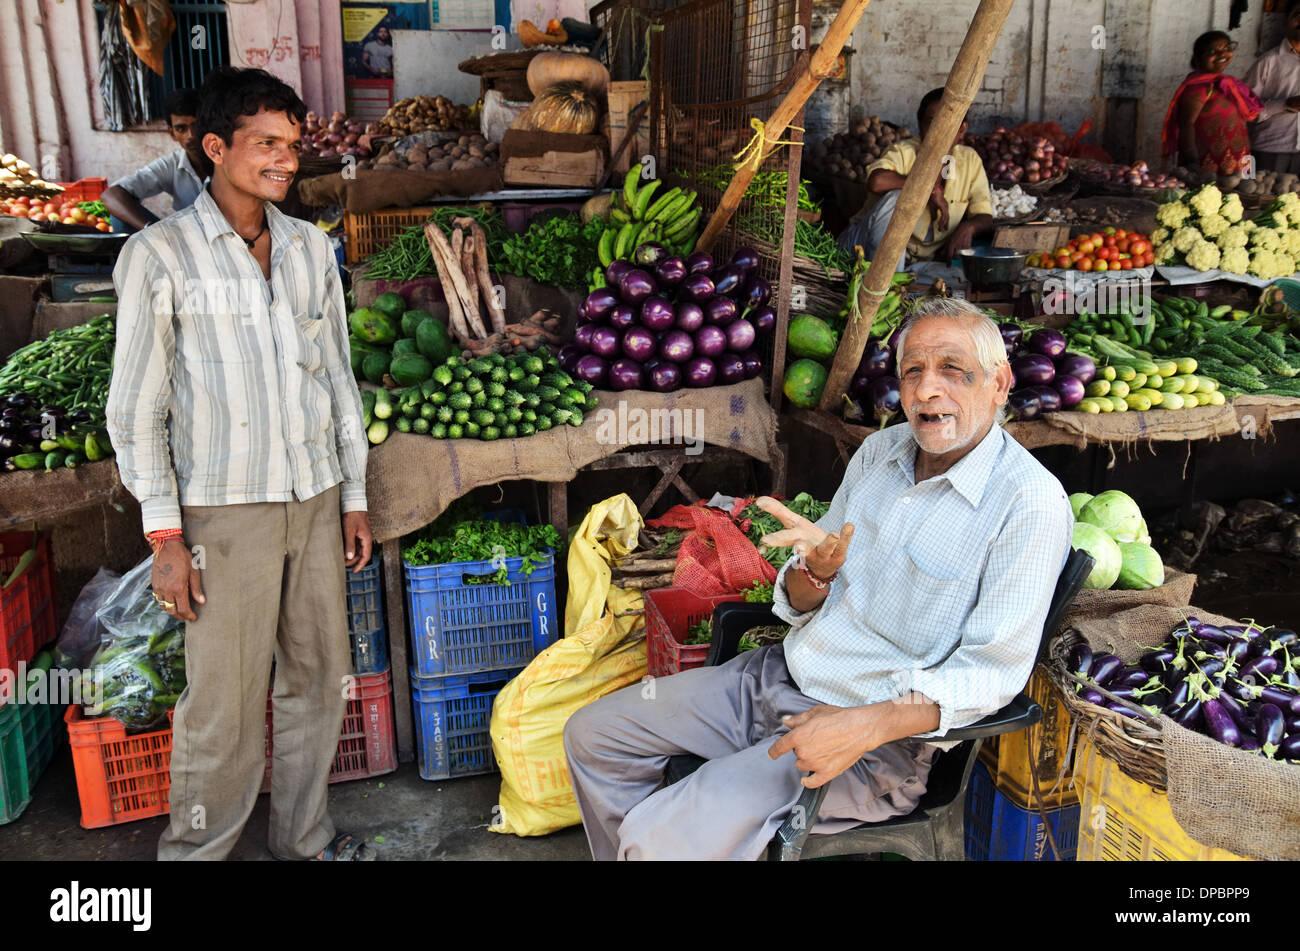 Greengrocery market, Haridwar, India - Stock Image